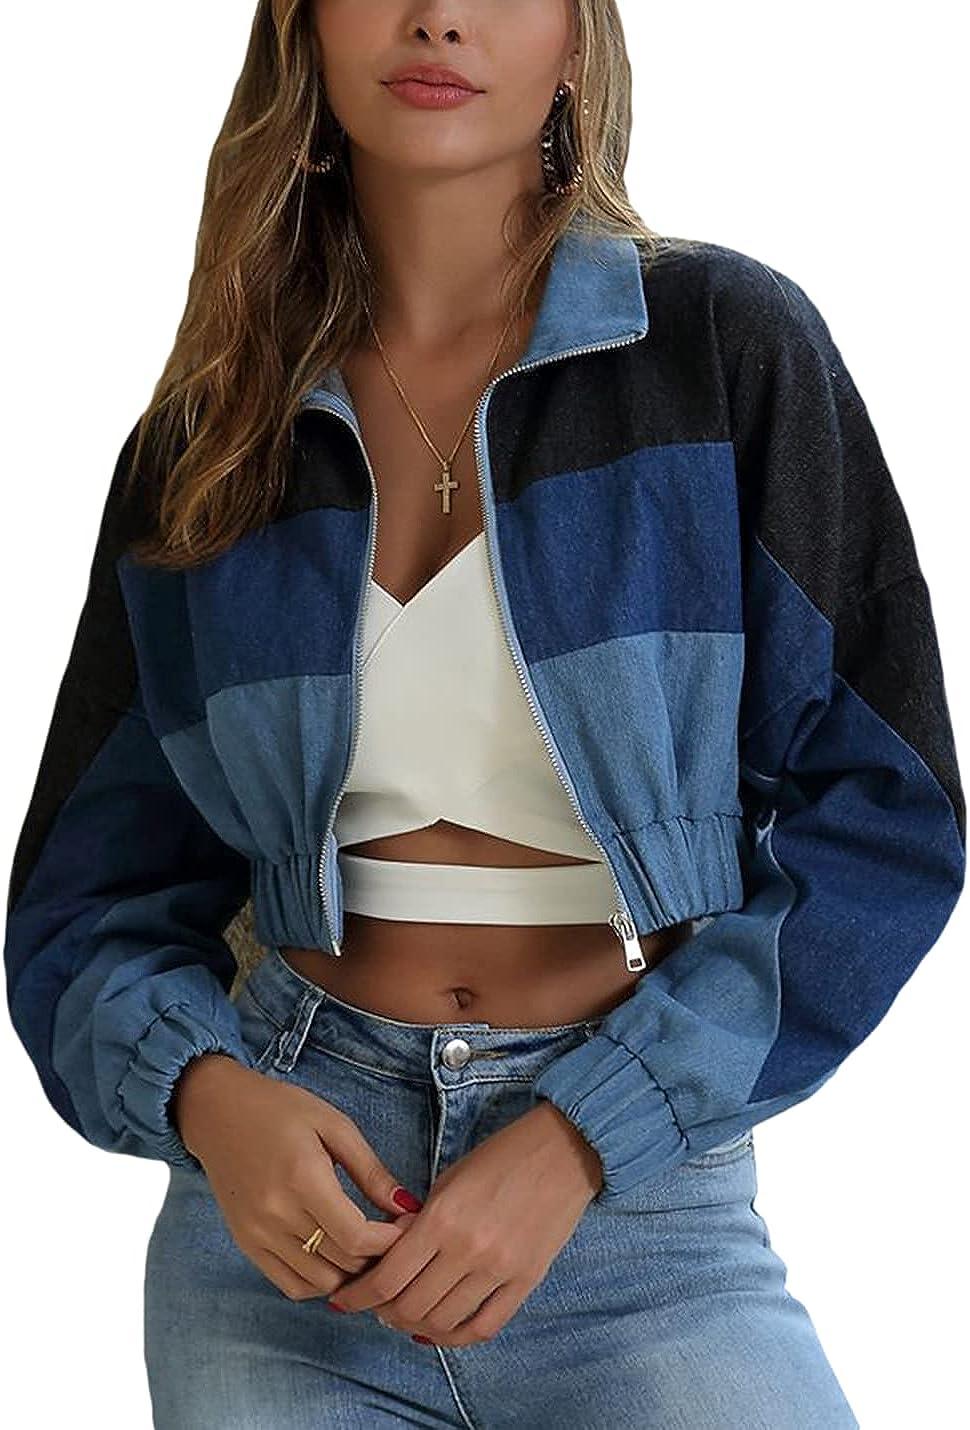 Omoone Women's Cropped Denim Jackets Zip Up Long Sleeve Color Patchwork Jean Coats